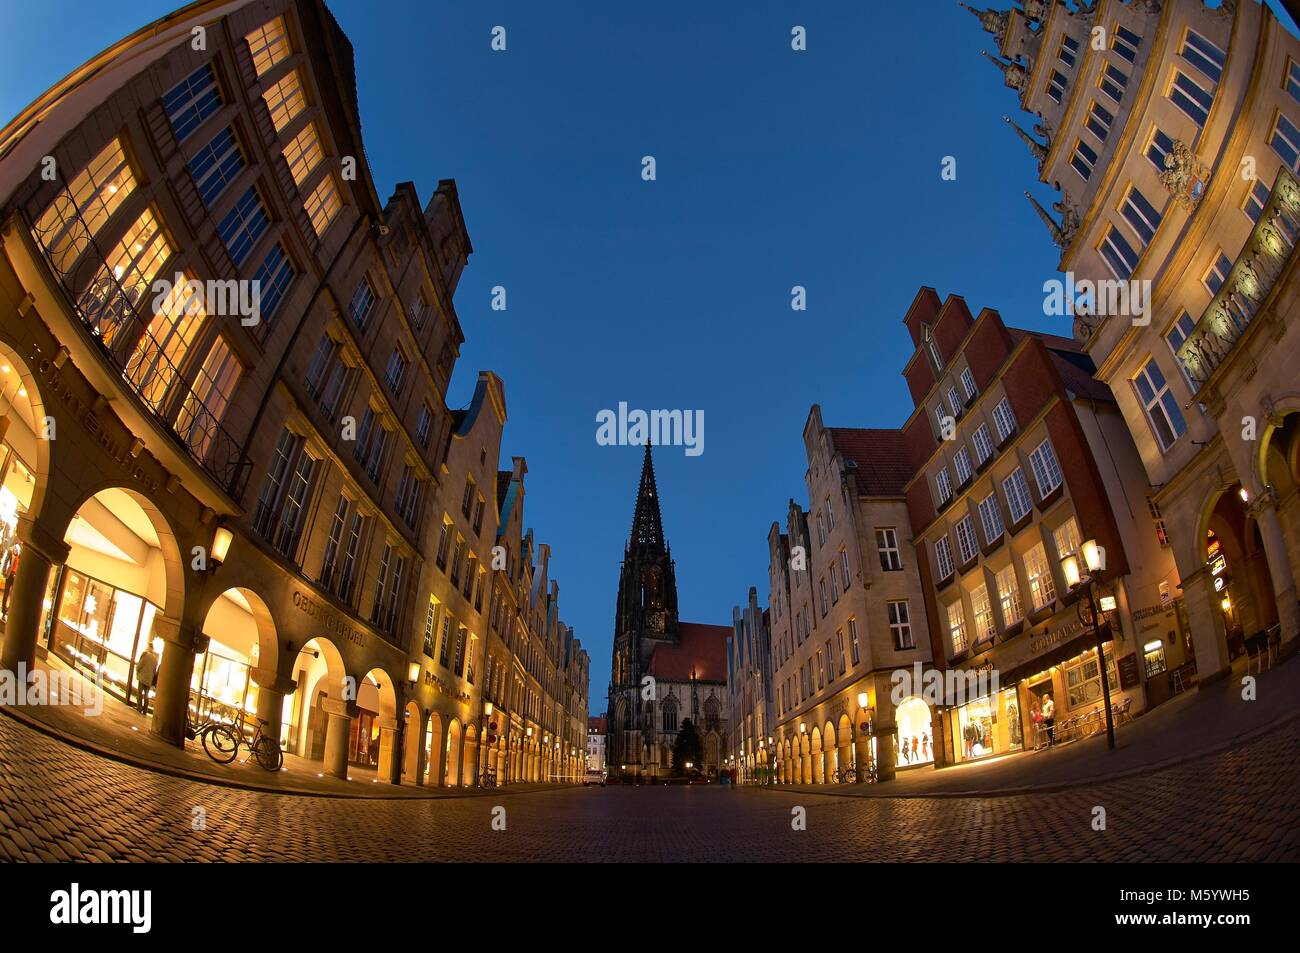 Prinzipalmarkt in Münster - Stock Image